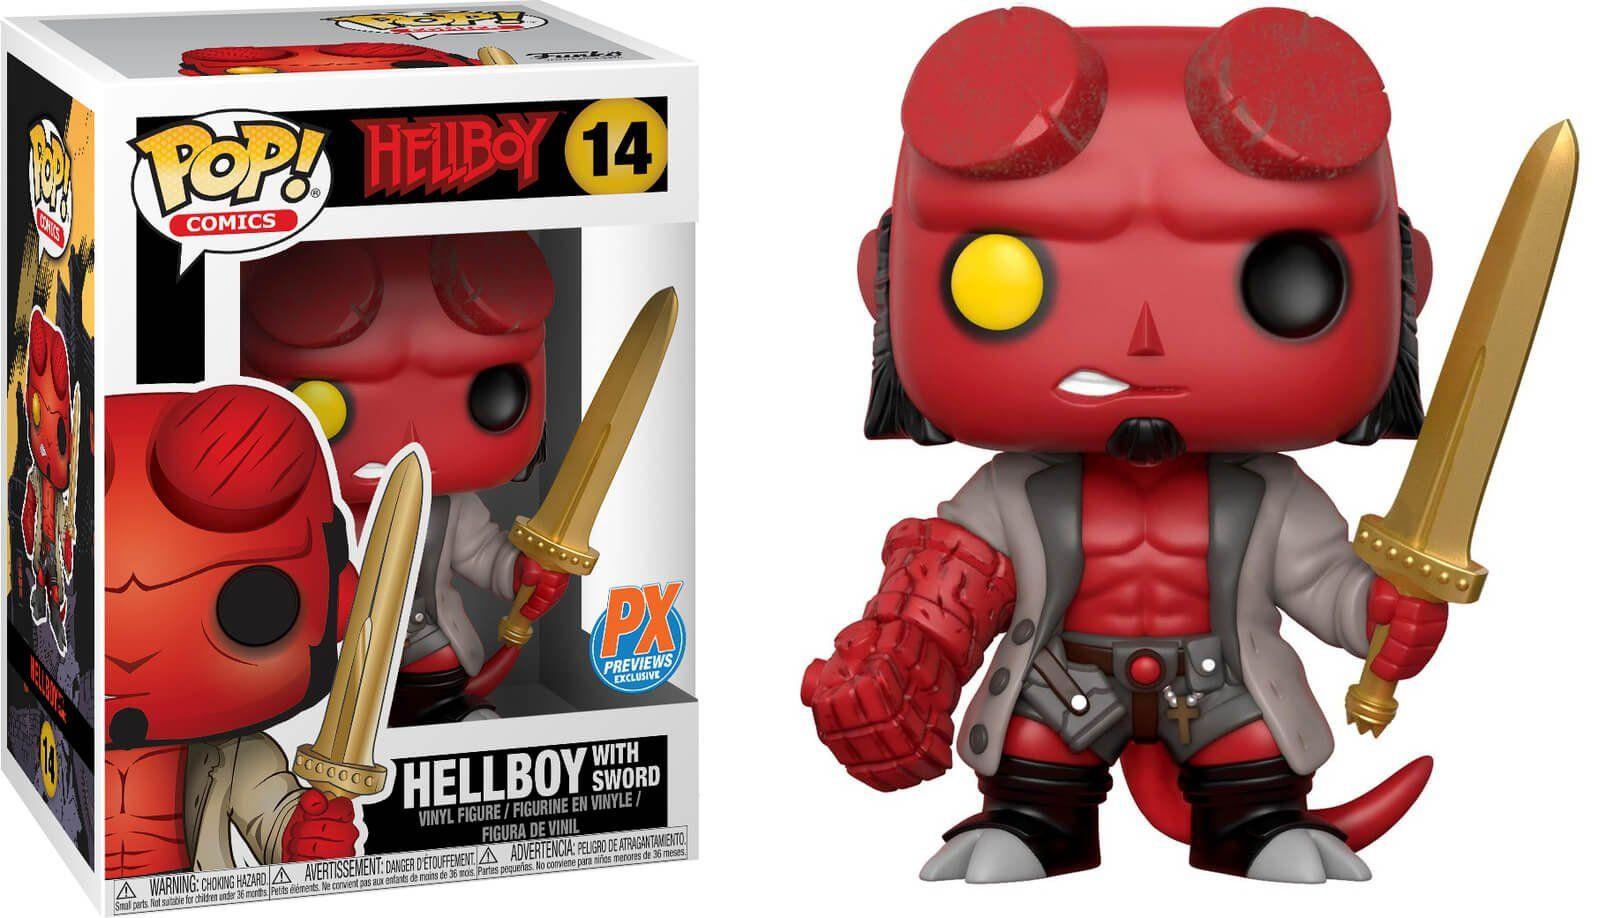 Funko Pop! Hellboy w/ Excalibur: Hellboy #14 - Funko